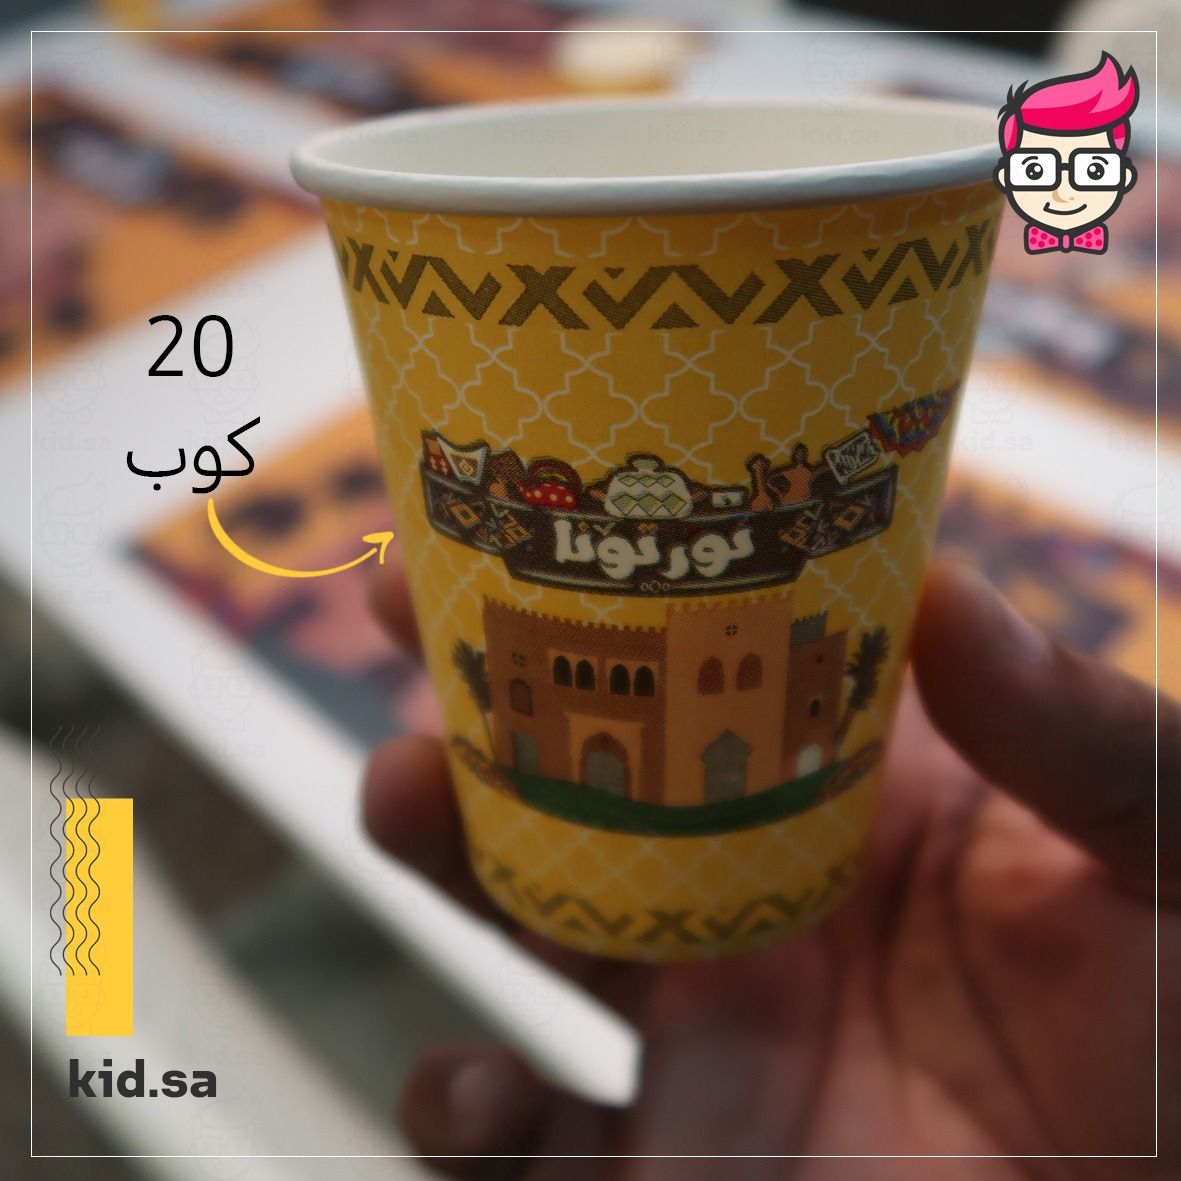 اكواب زينة رمضان 2021 In 2021 Glassware Tableware